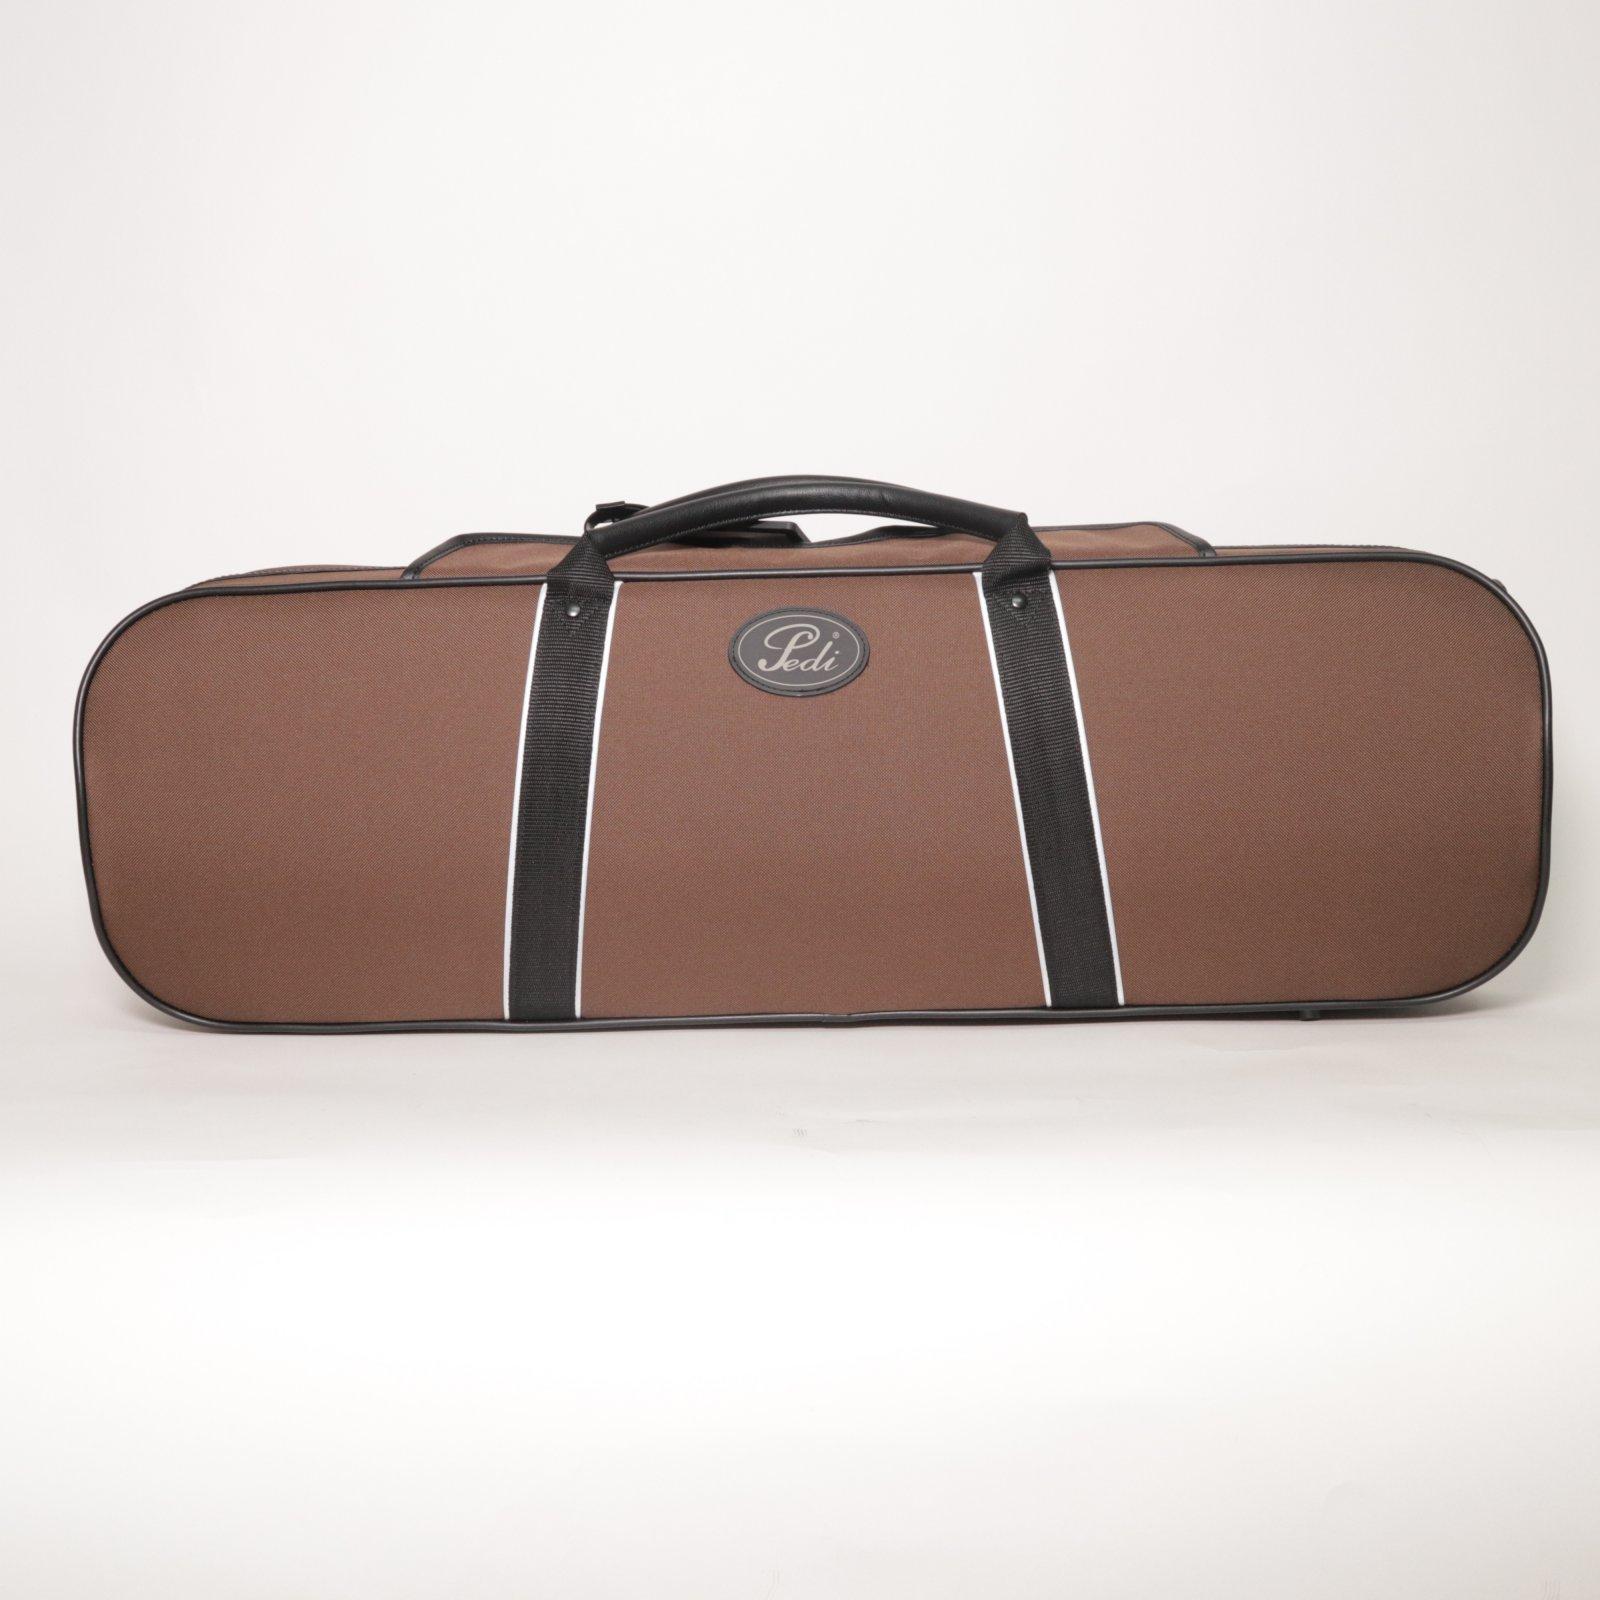 Pedi Niteflash Brown Violin Case